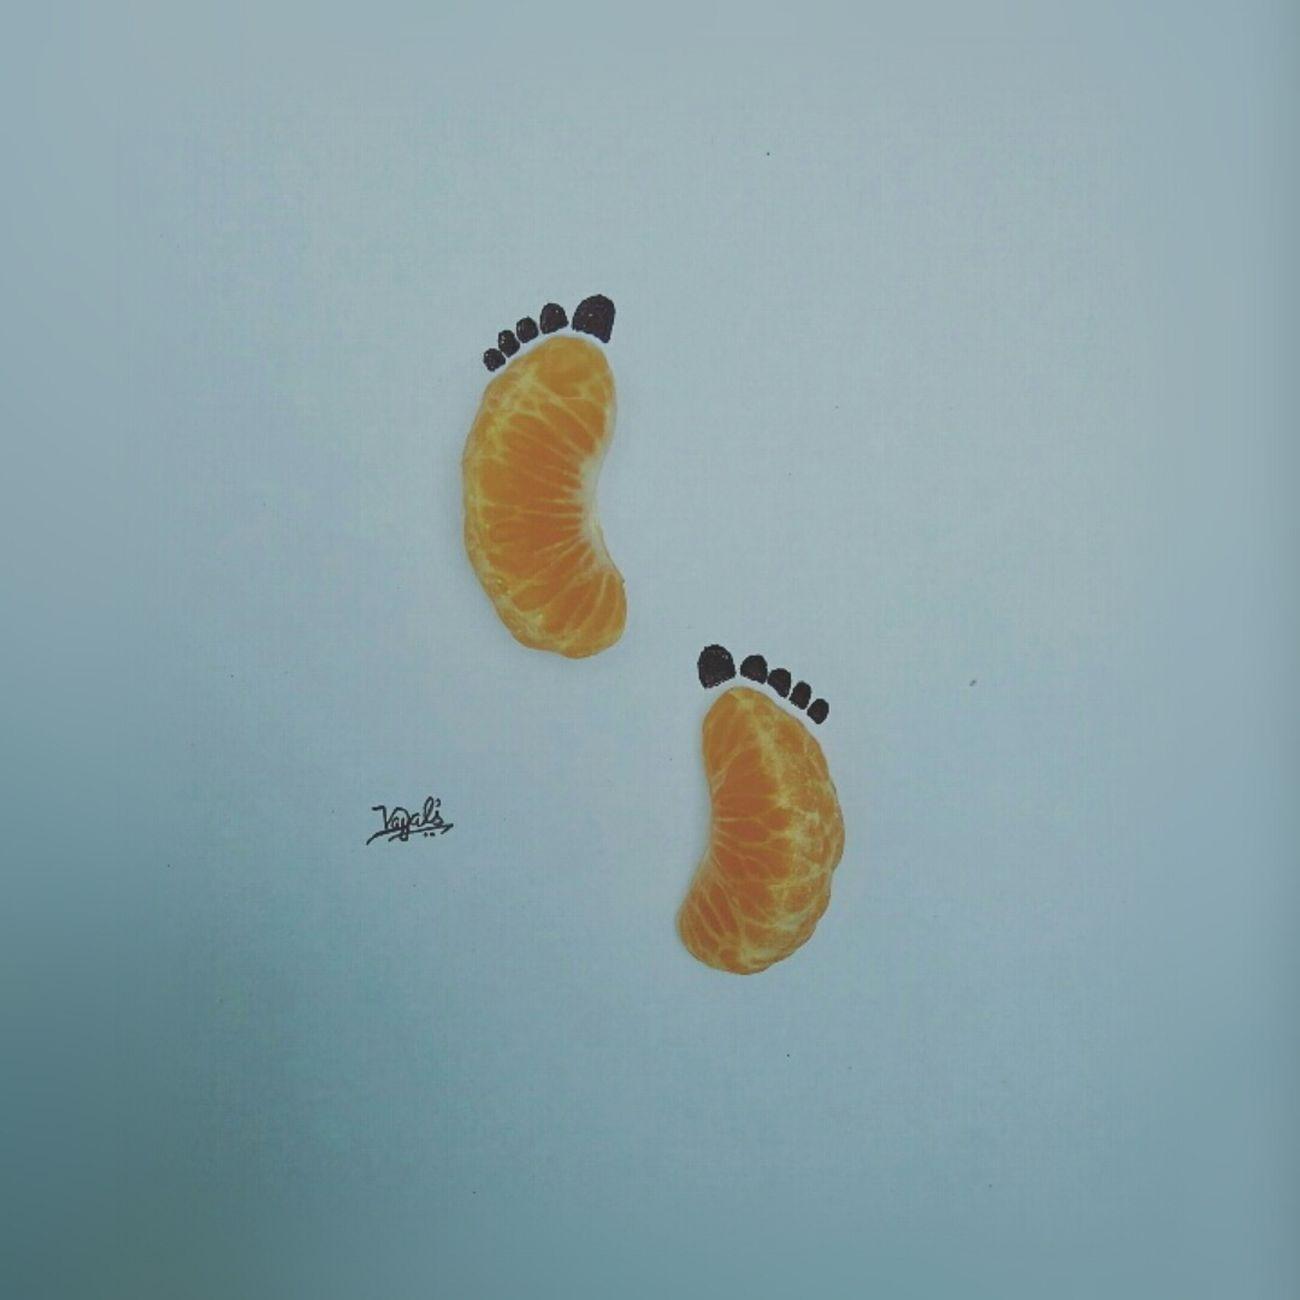 🍊RANGE ART-5 (Foot Marks)🍊 Art MyArt Art Is Everywhere Myartbook ArtWork Creative Doodle Orange Artoftheday Art, Drawing, Creativity ArtInMyLife Myartwork Artgallery Creative Shots Artphoto Creativity Artist Draw Art Gallery Arte Drawing, Painting, Artwork Pencilart Artsy Artworks Artphotography